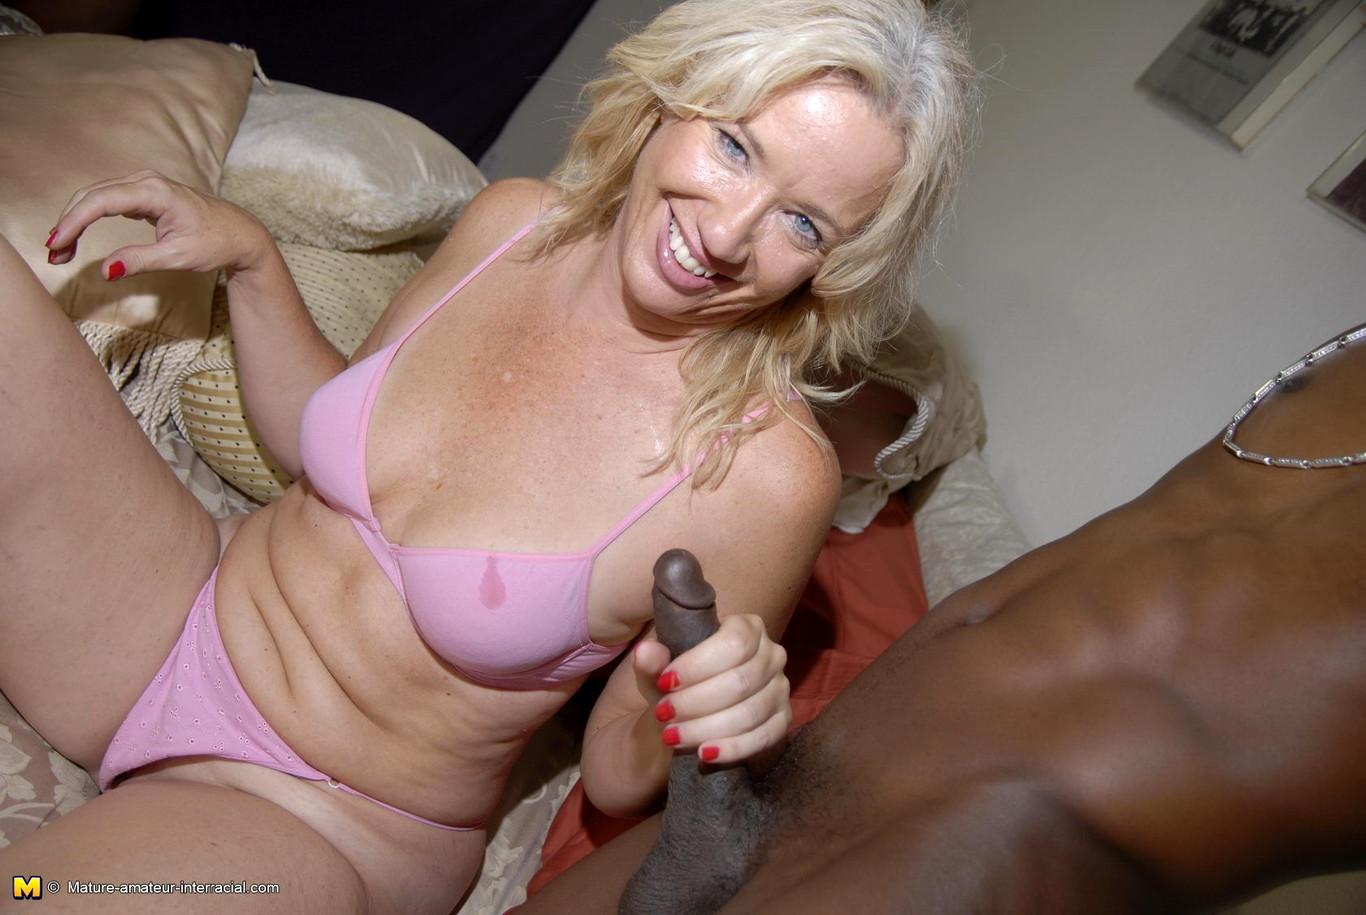 Mature Nl Maturenl Model Tons Of Mature Nudity Sex Hd Pics